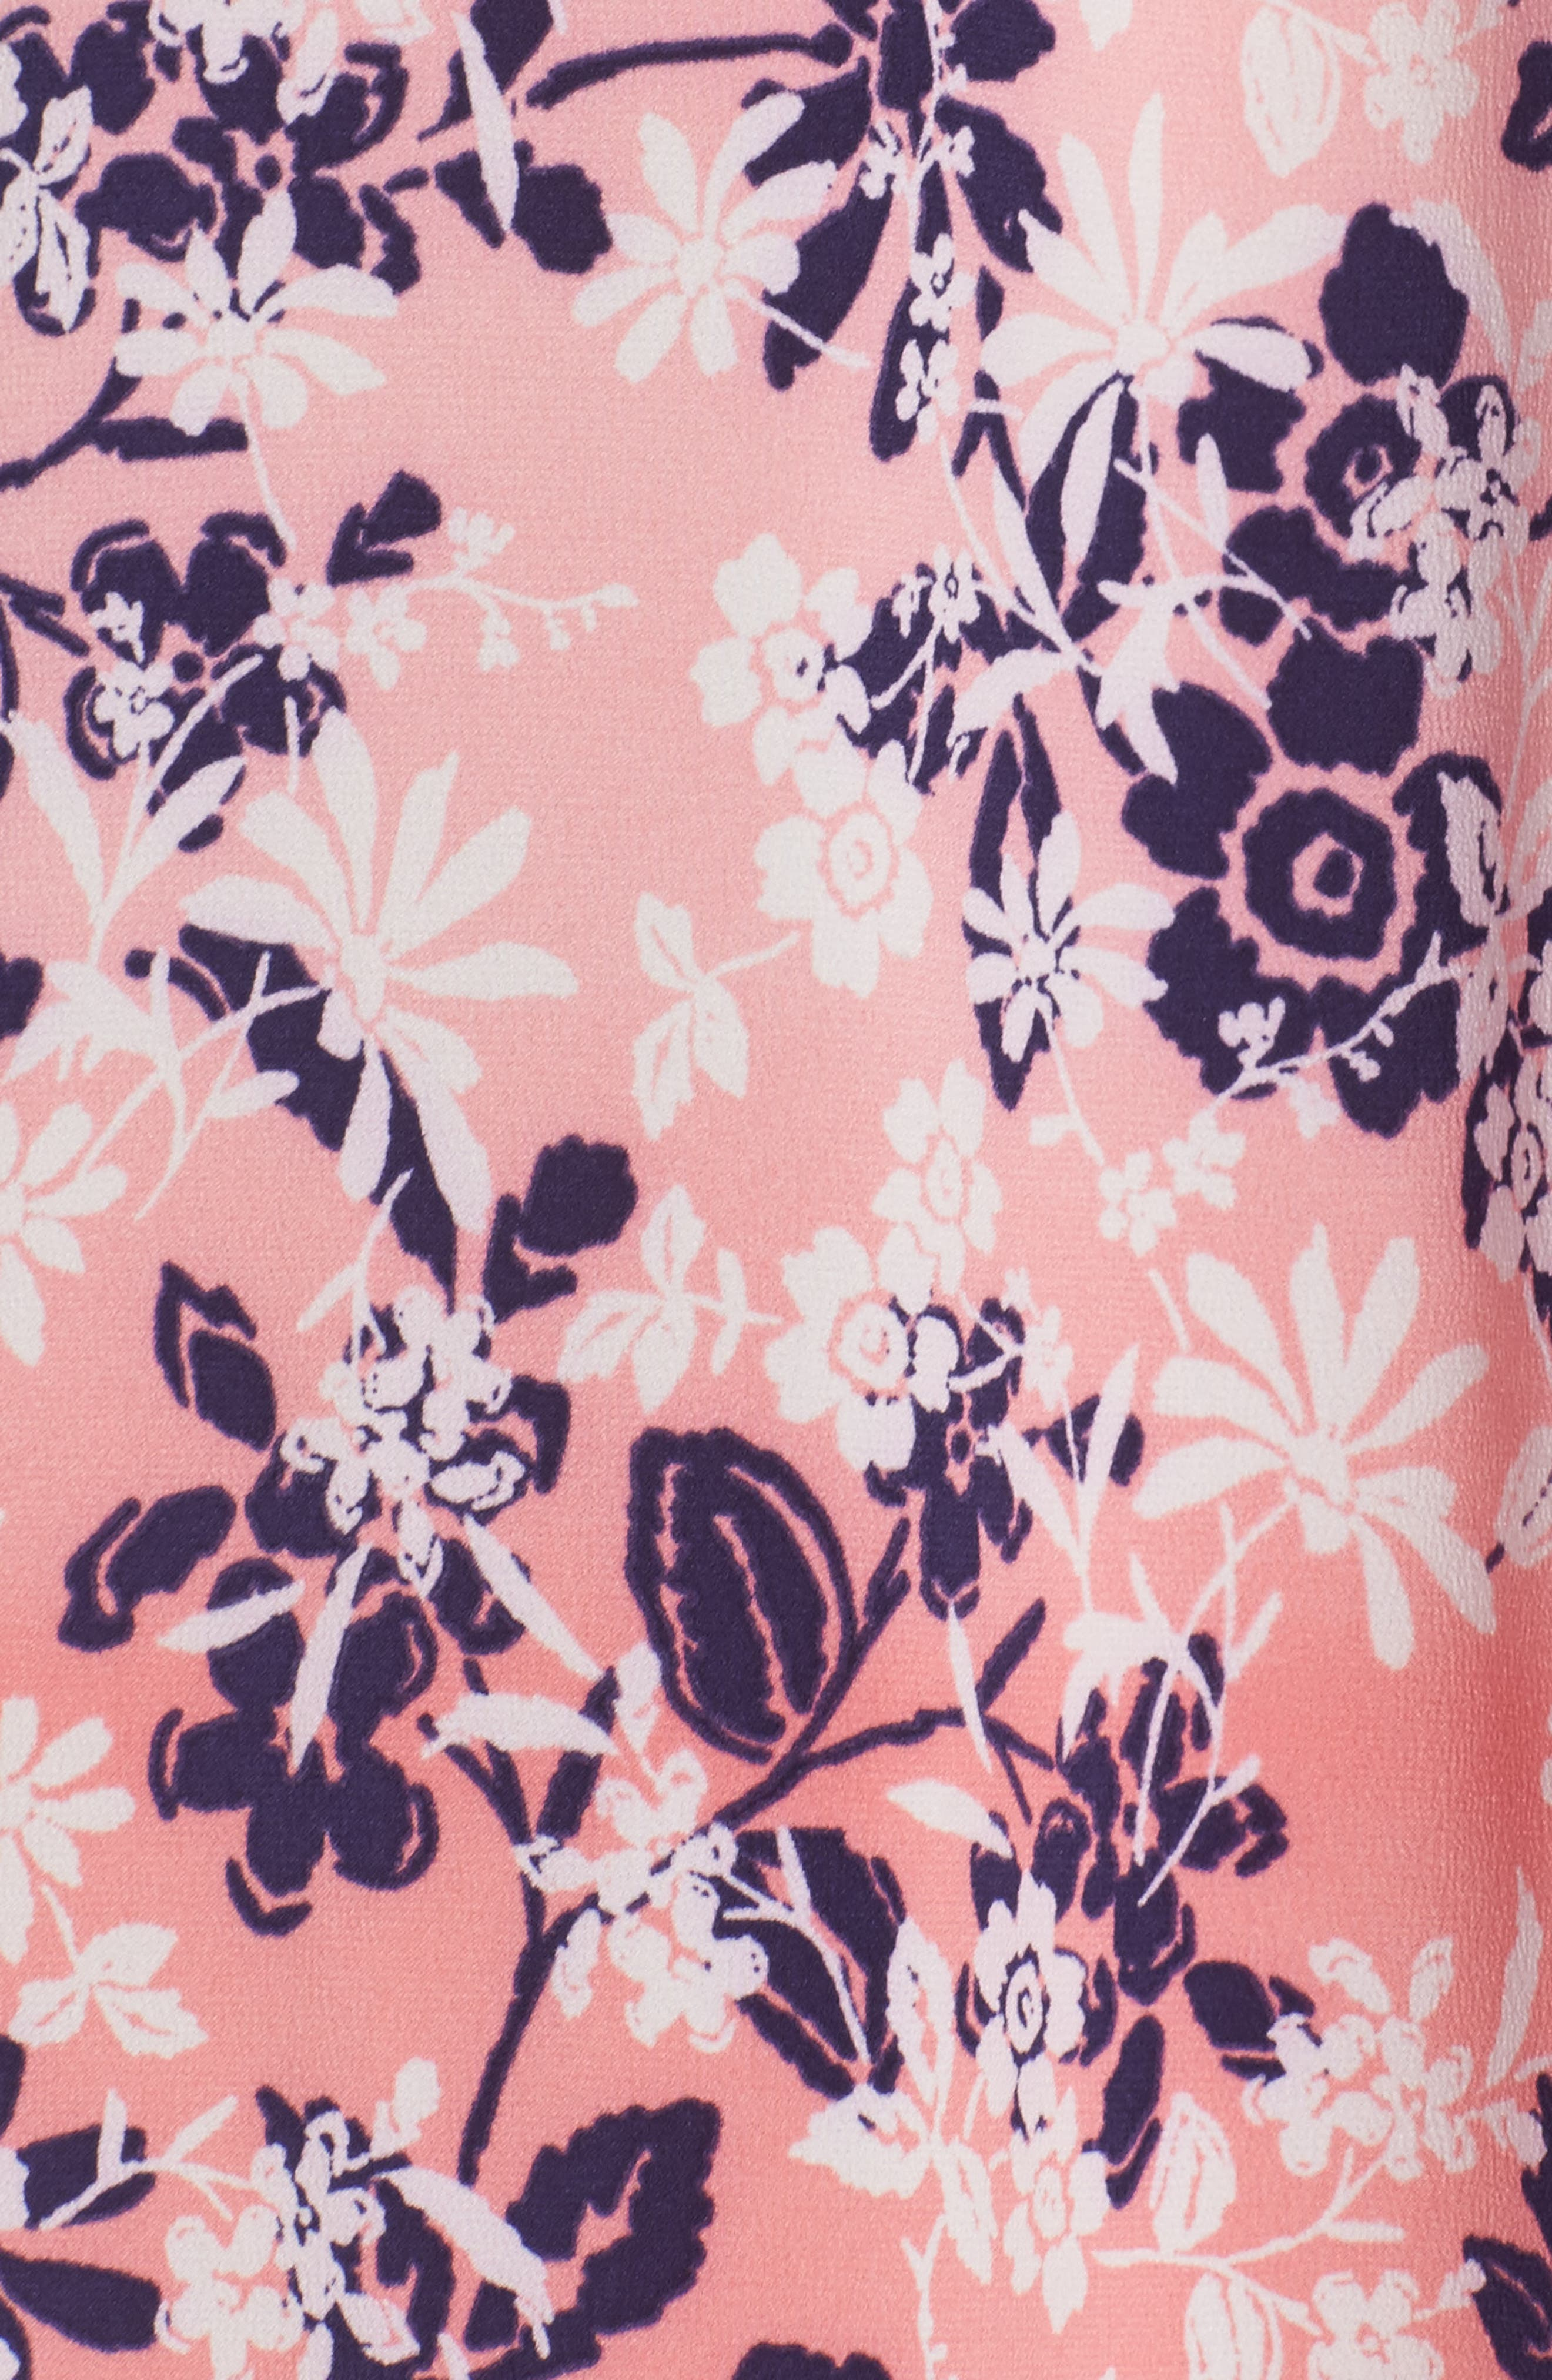 Sleepwear Floral Print Caftan,                             Alternate thumbnail 5, color,                             666